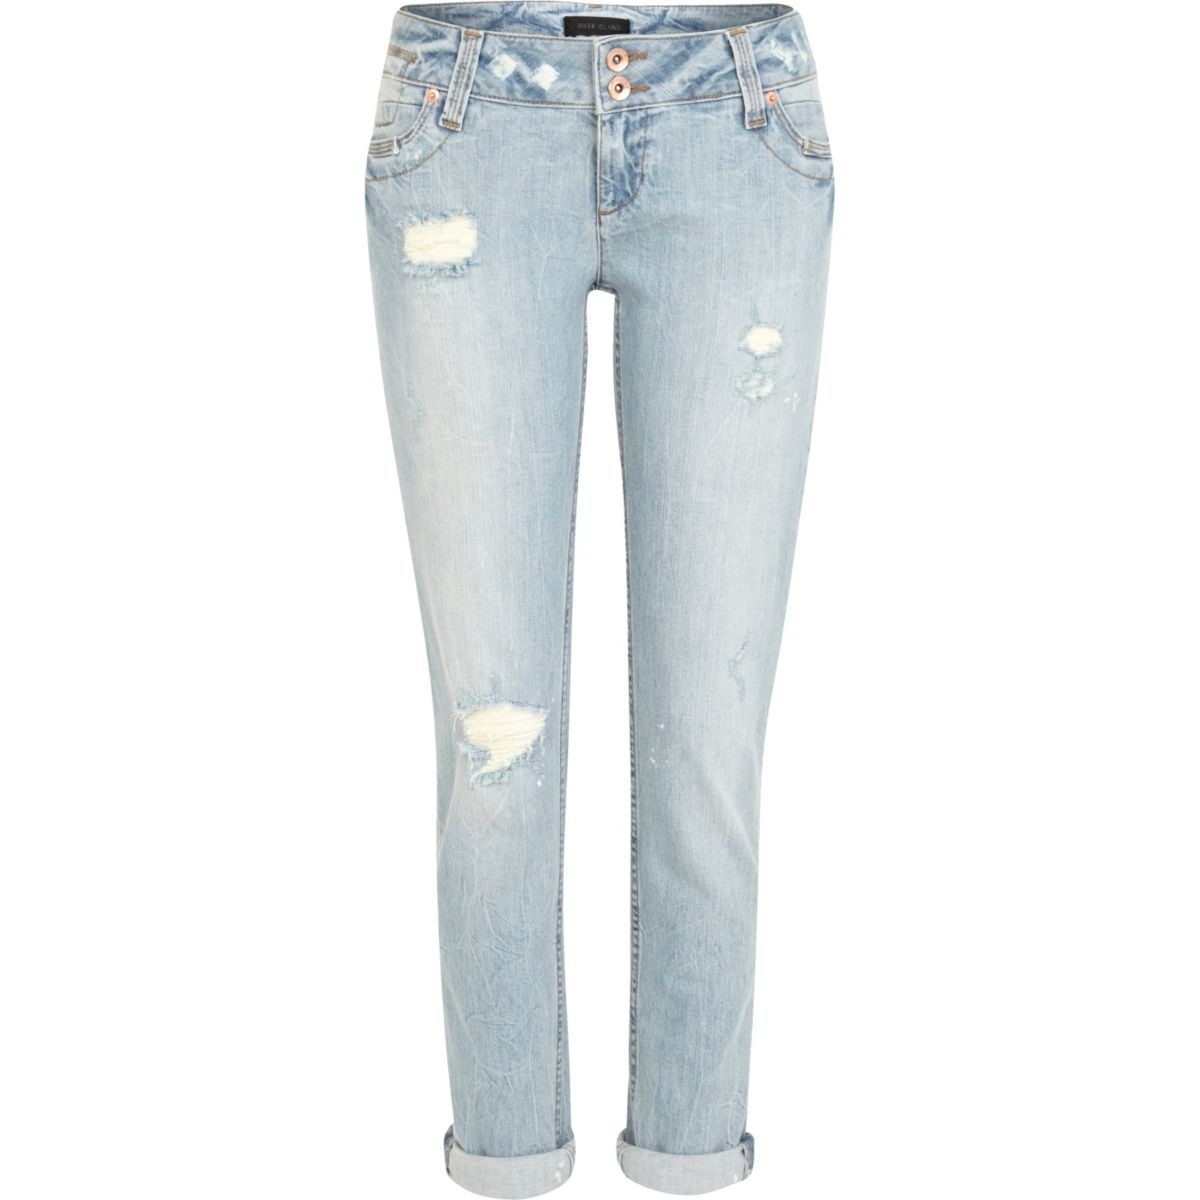 Light wash ripped Matilda skinny jeans